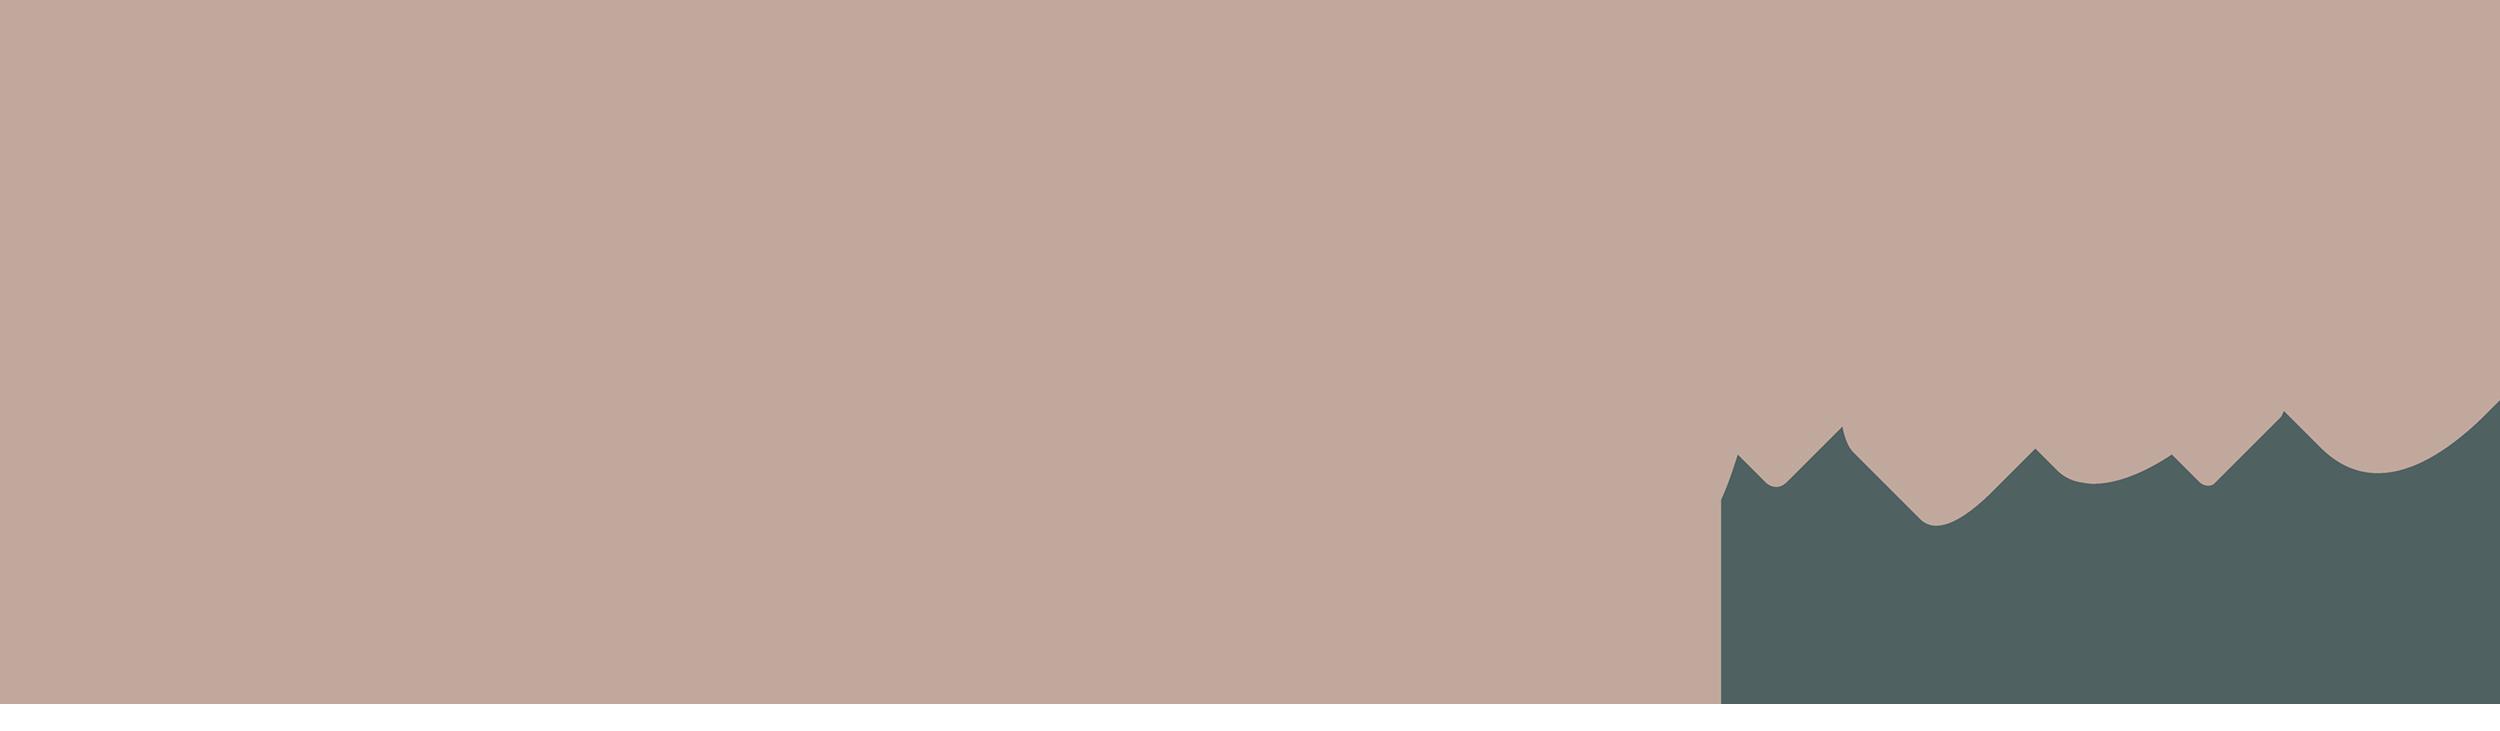 Kelly_Noten_Full_Logo_Color_2500pxkopie